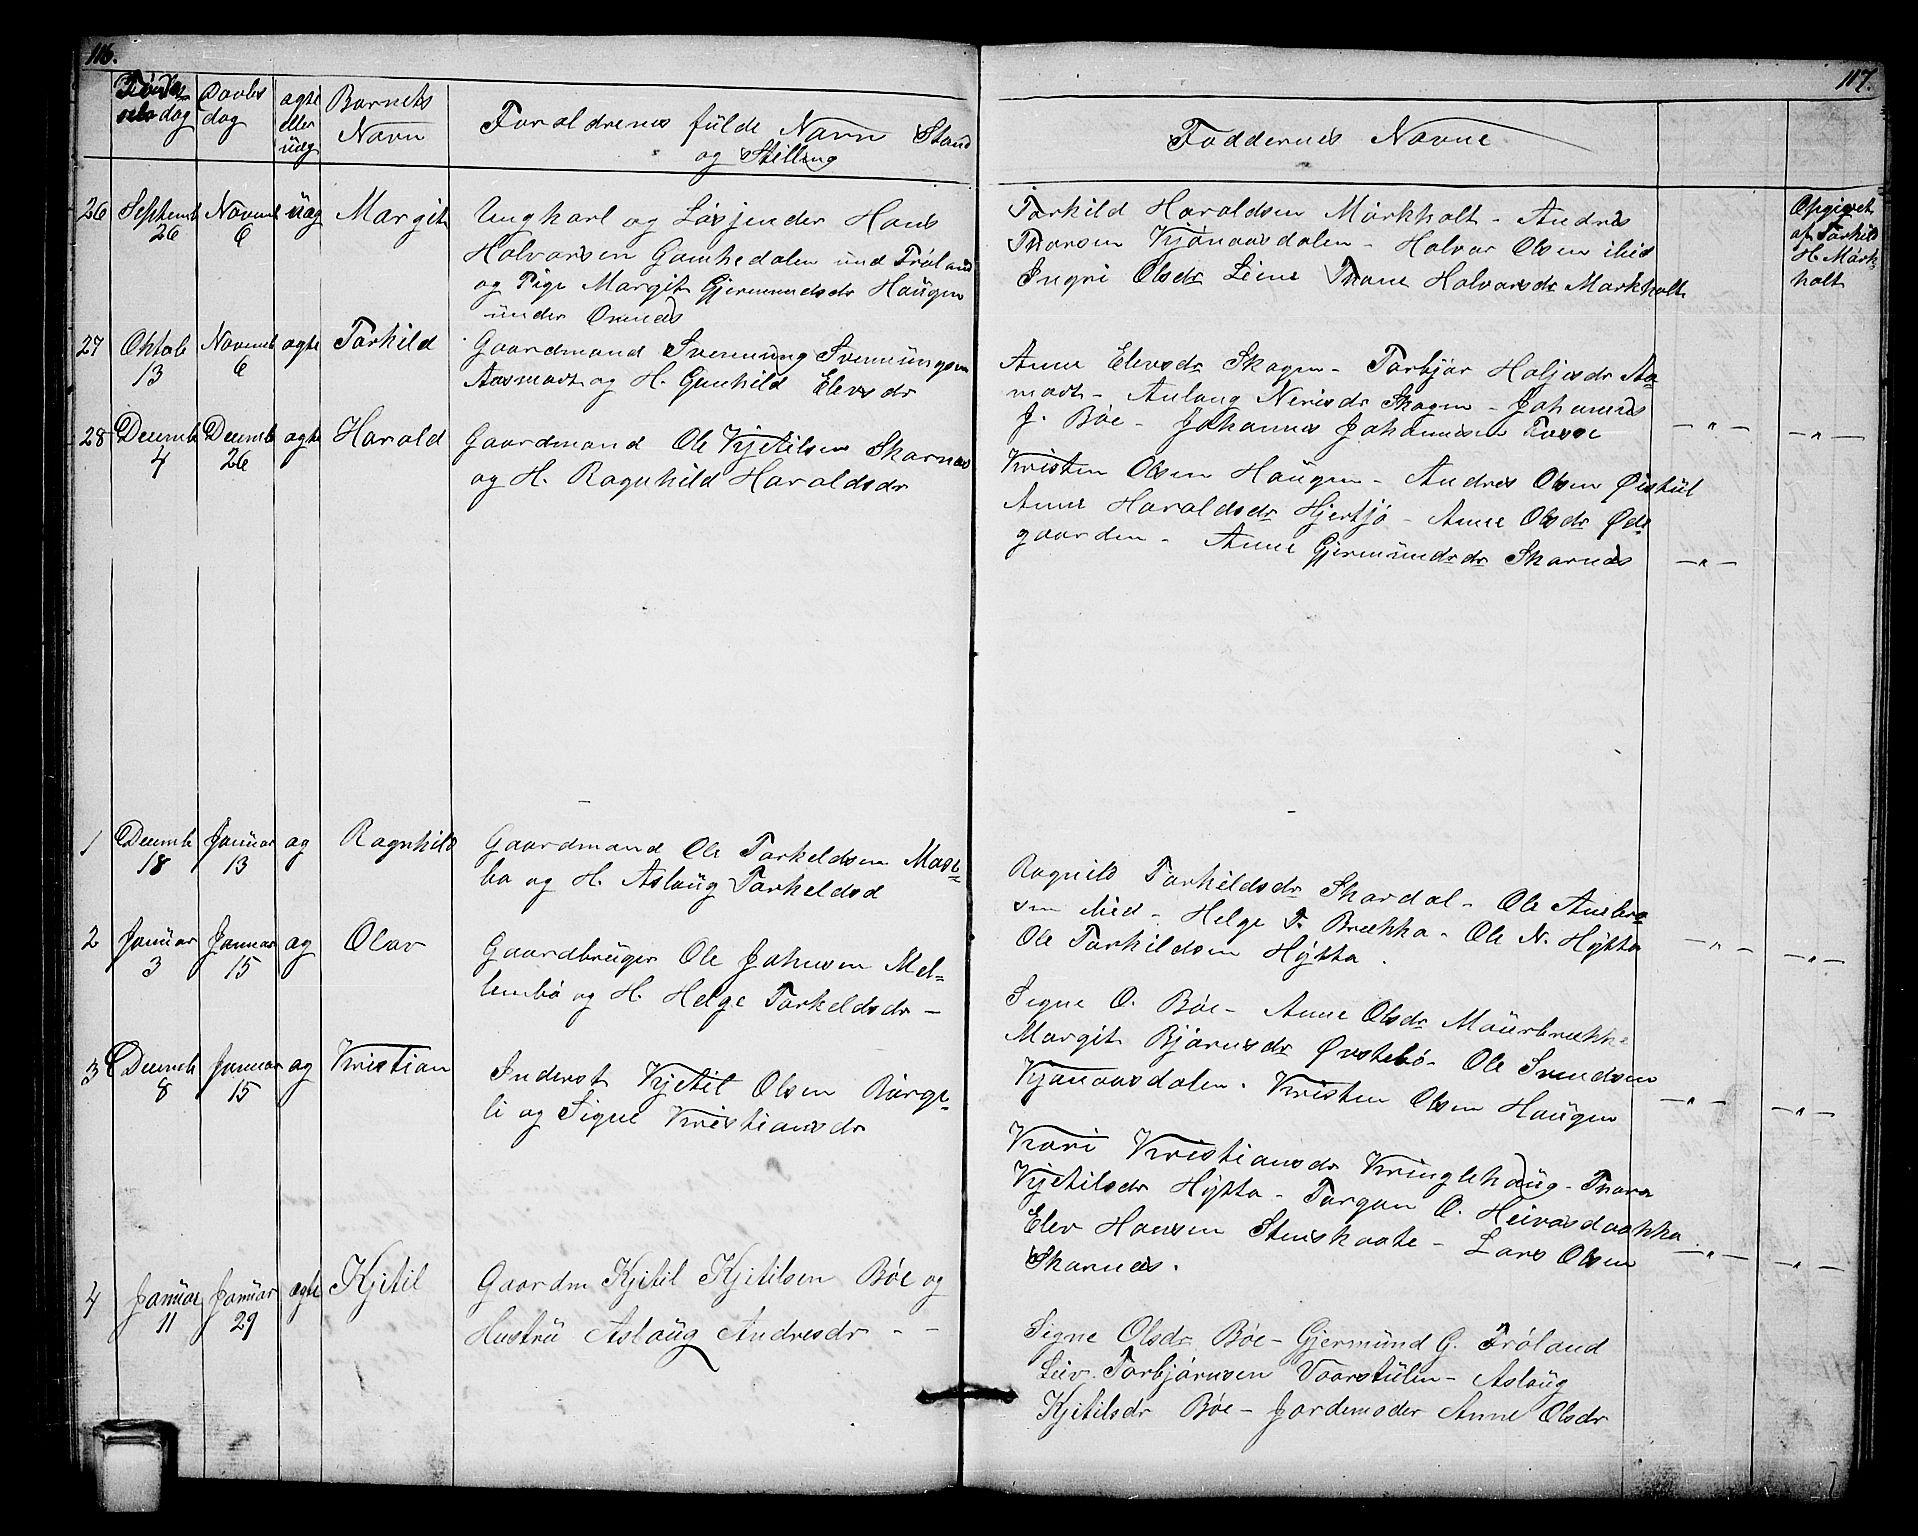 SAKO, Hjartdal kirkebøker, G/Gb/L0002: Klokkerbok nr. II 2, 1854-1884, s. 116-117